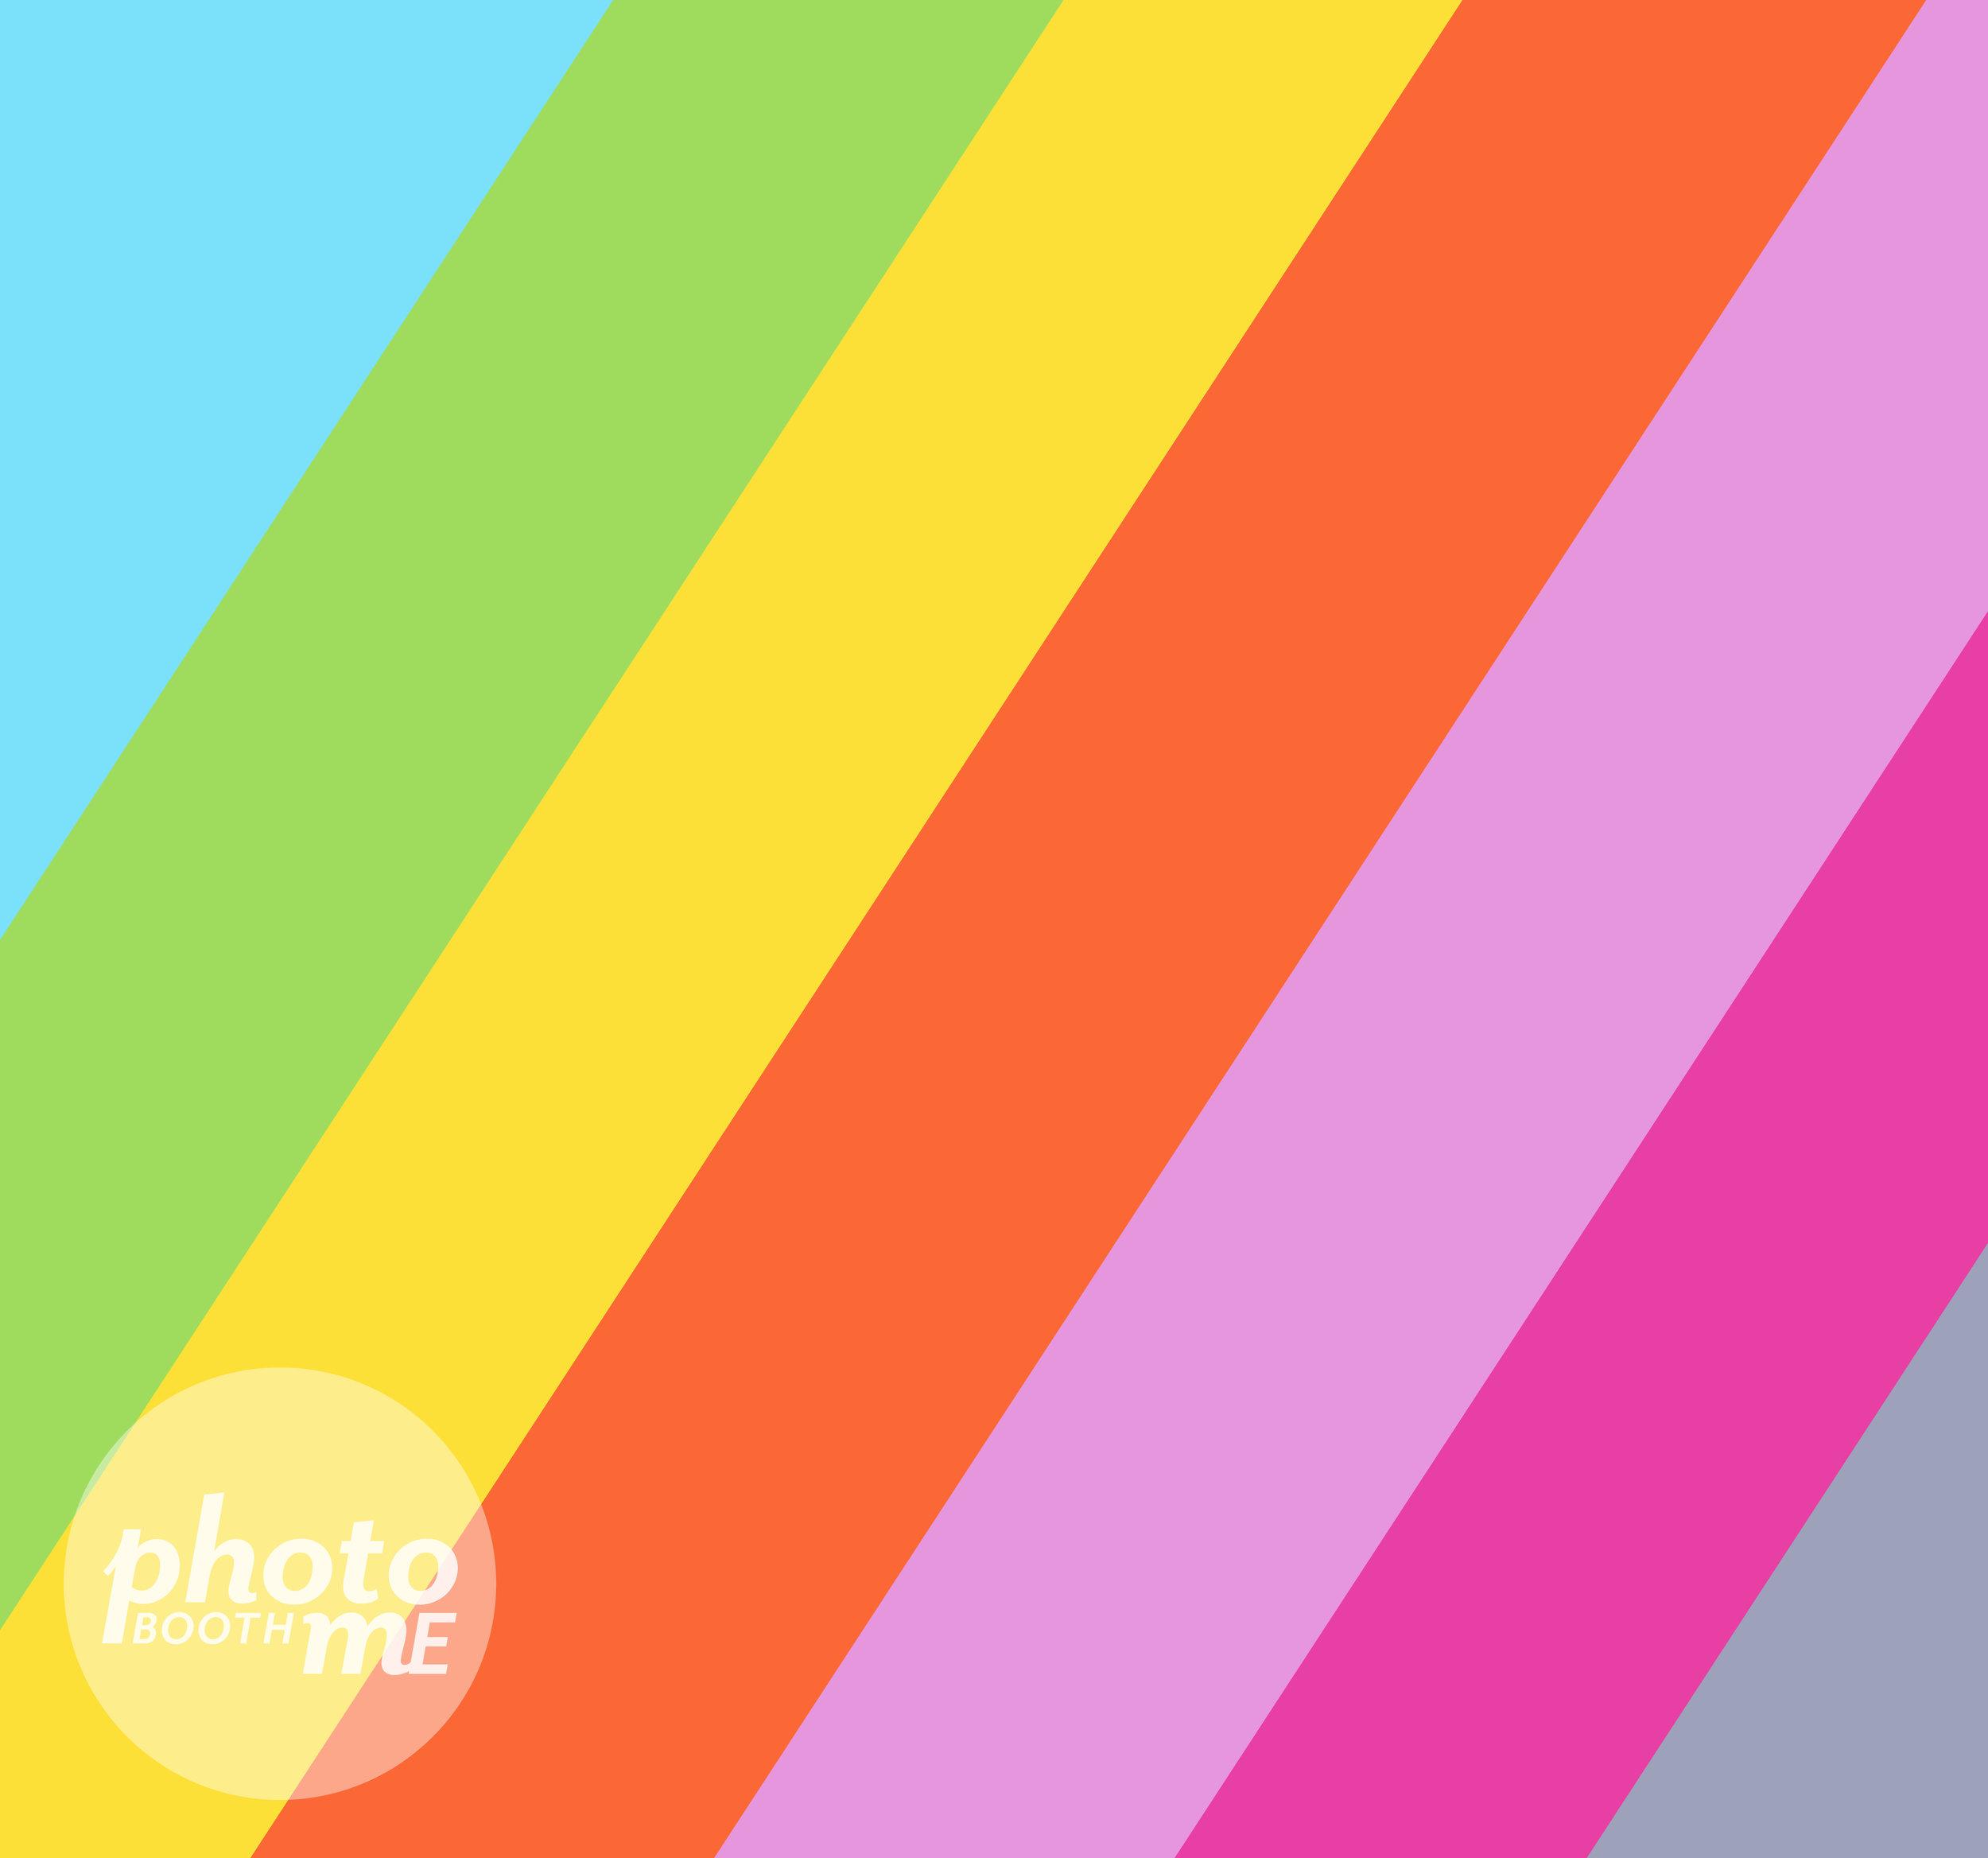 NEW! The Rainbow